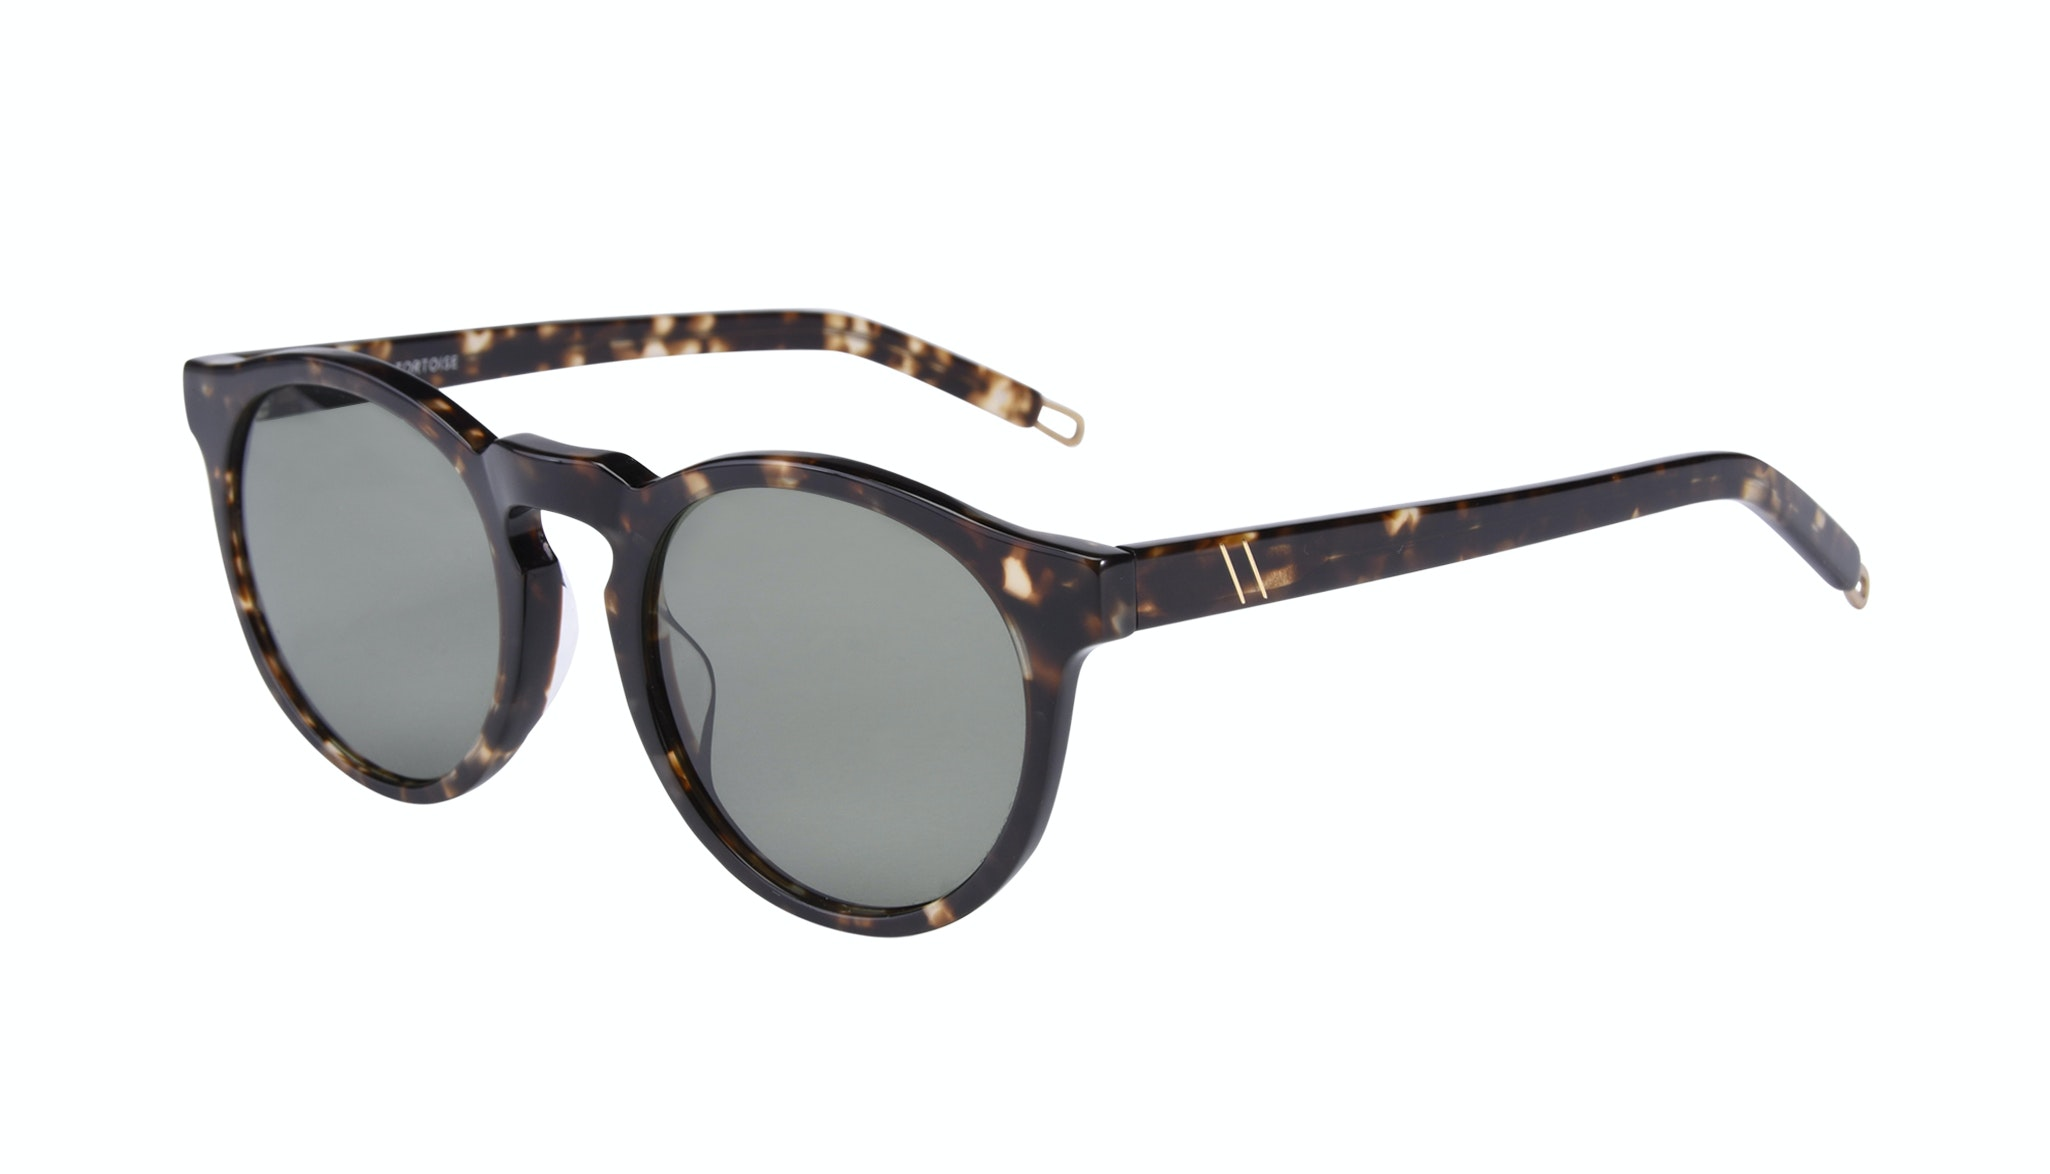 Affordable Fashion Glasses Round Sunglasses Men Ace Tortoise Tilt